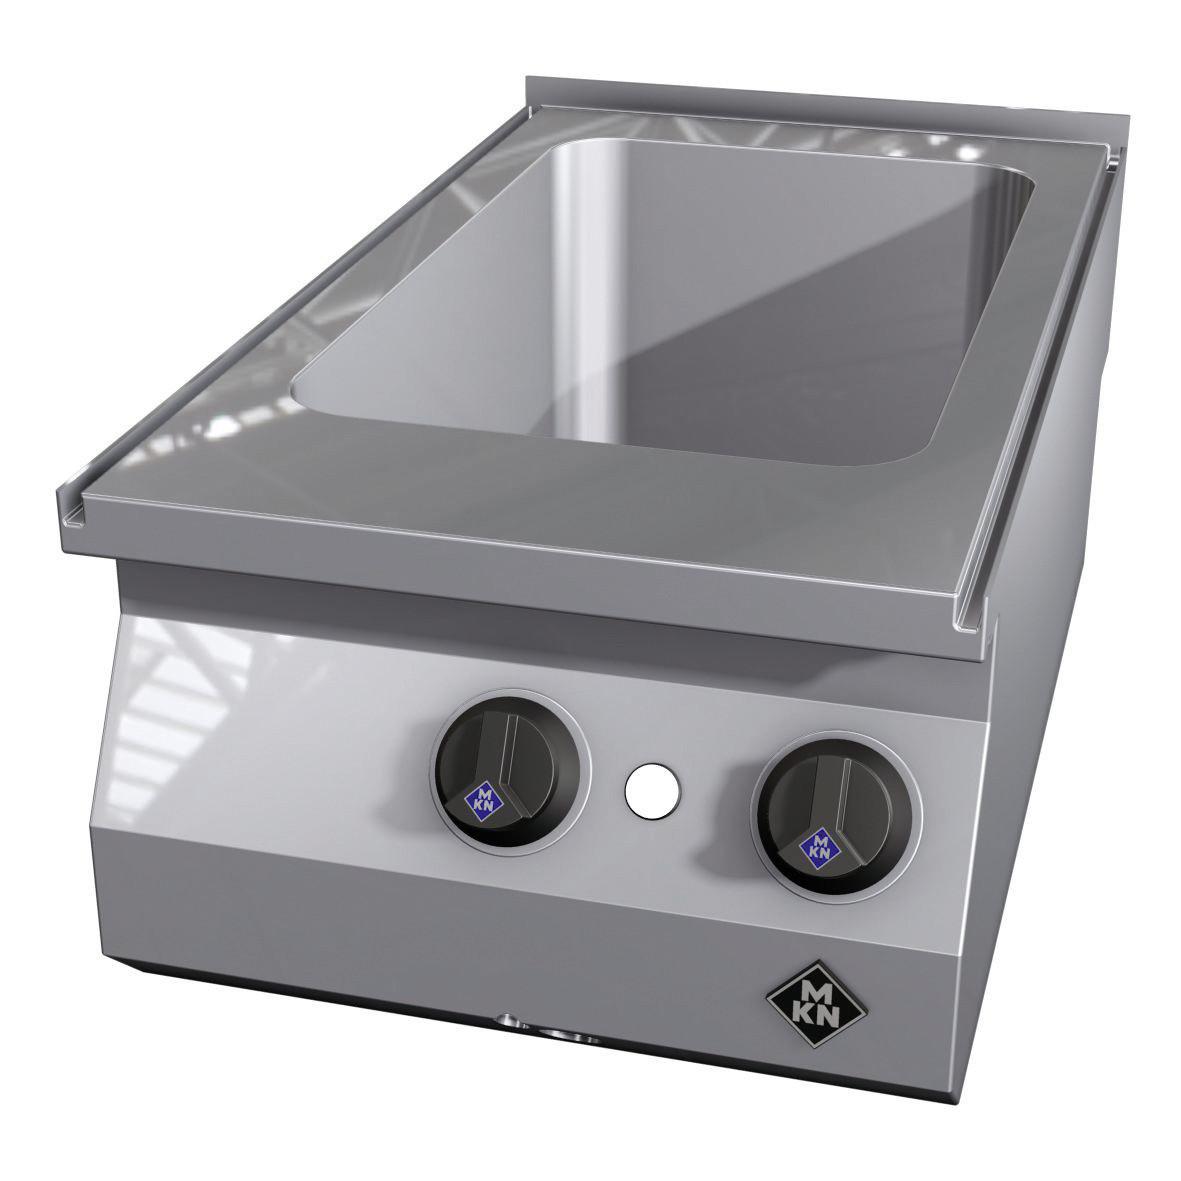 Elektro-Bain-Marie GN 1/1 Counter SL / Wanne 305 x 510 mm